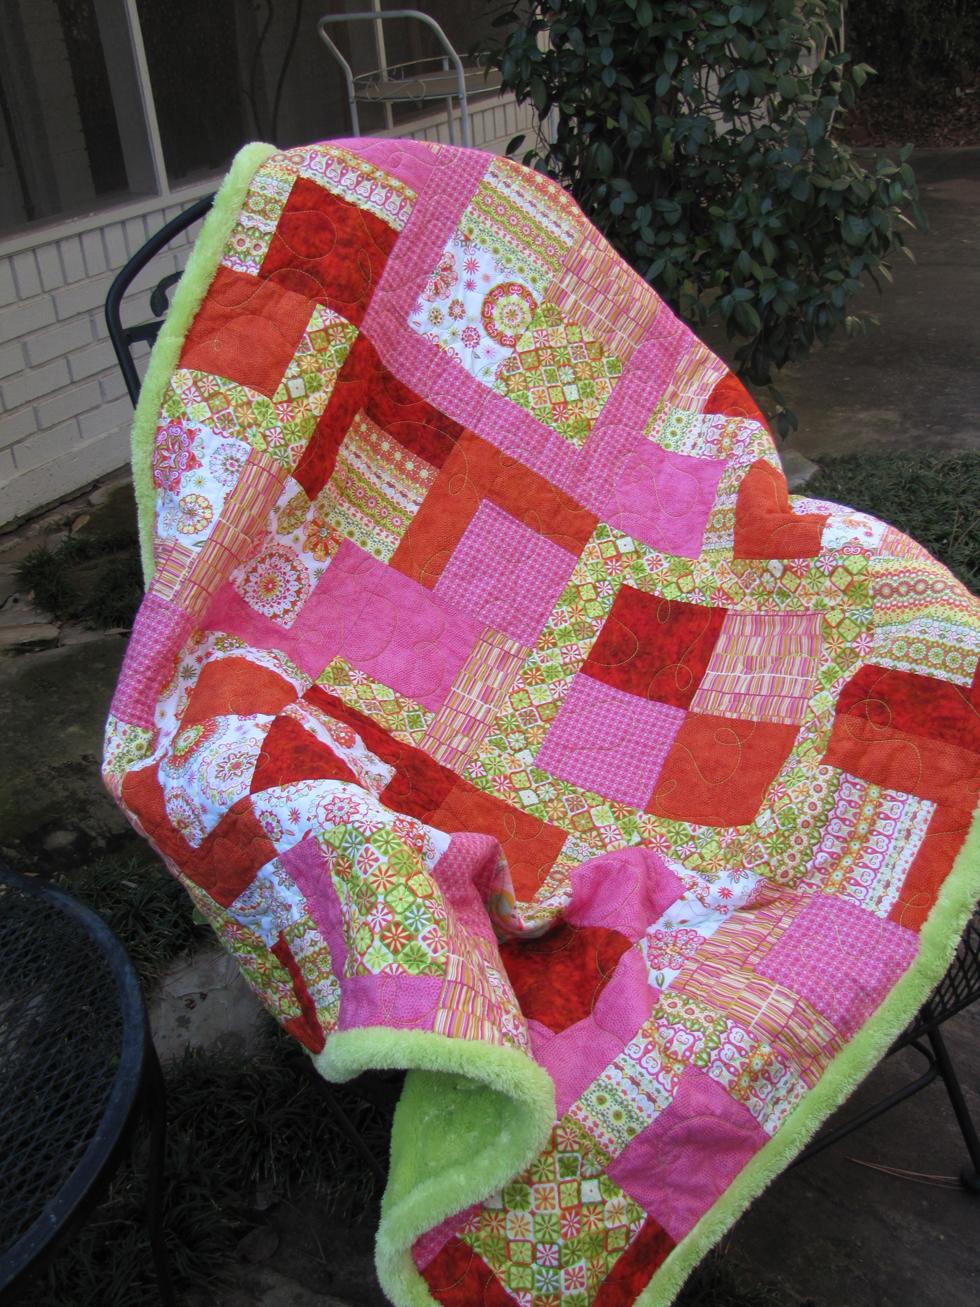 Child's Bright Snuggle Quilt